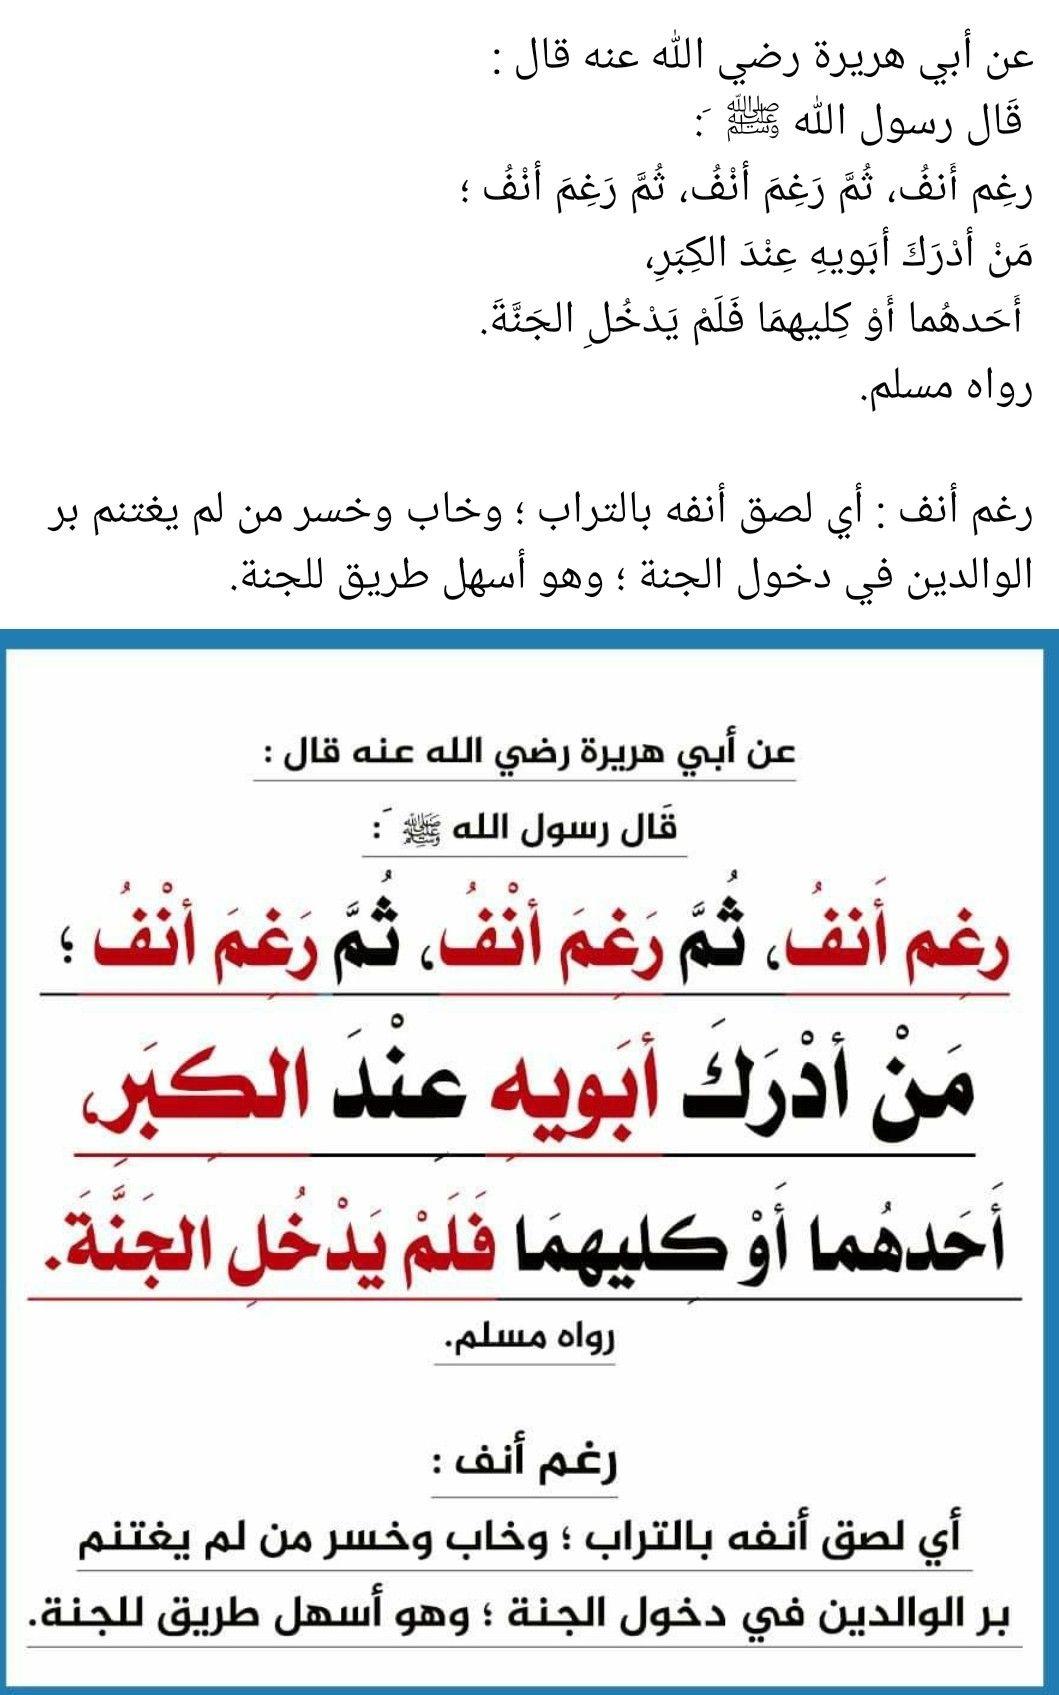 Pin By The Noble Quran On I Love Allah Quran Islam The Prophet Miracles Hadith Heaven Prophets Faith Prayer Dua حكم وعبر احاديث الله اسلام قرآن دعاء Ahadith Peace Math